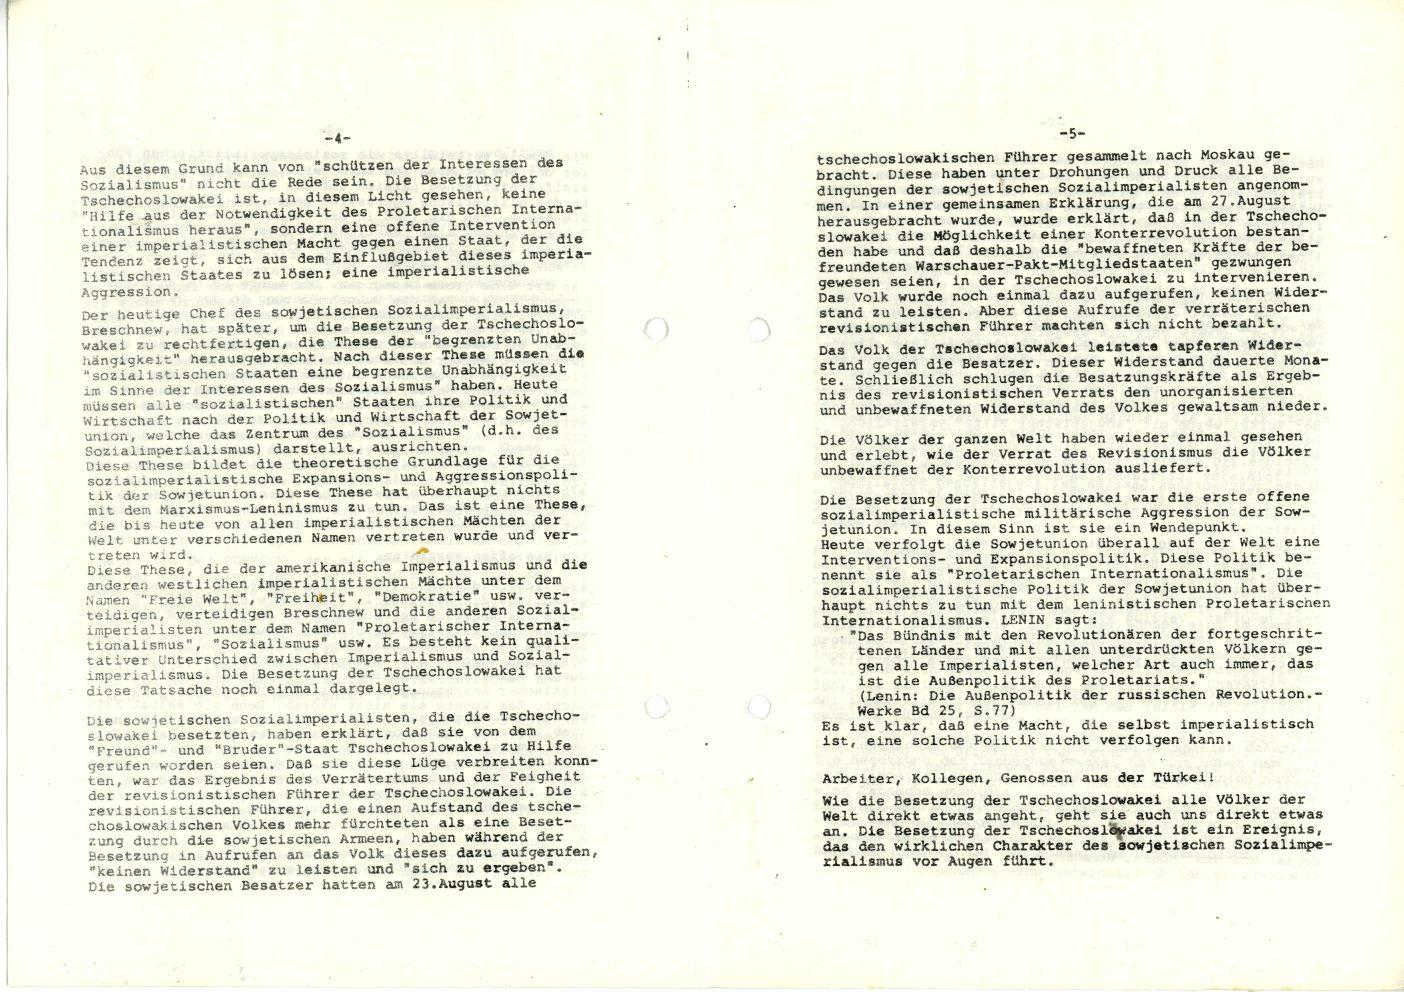 TKPML_1977_02_04